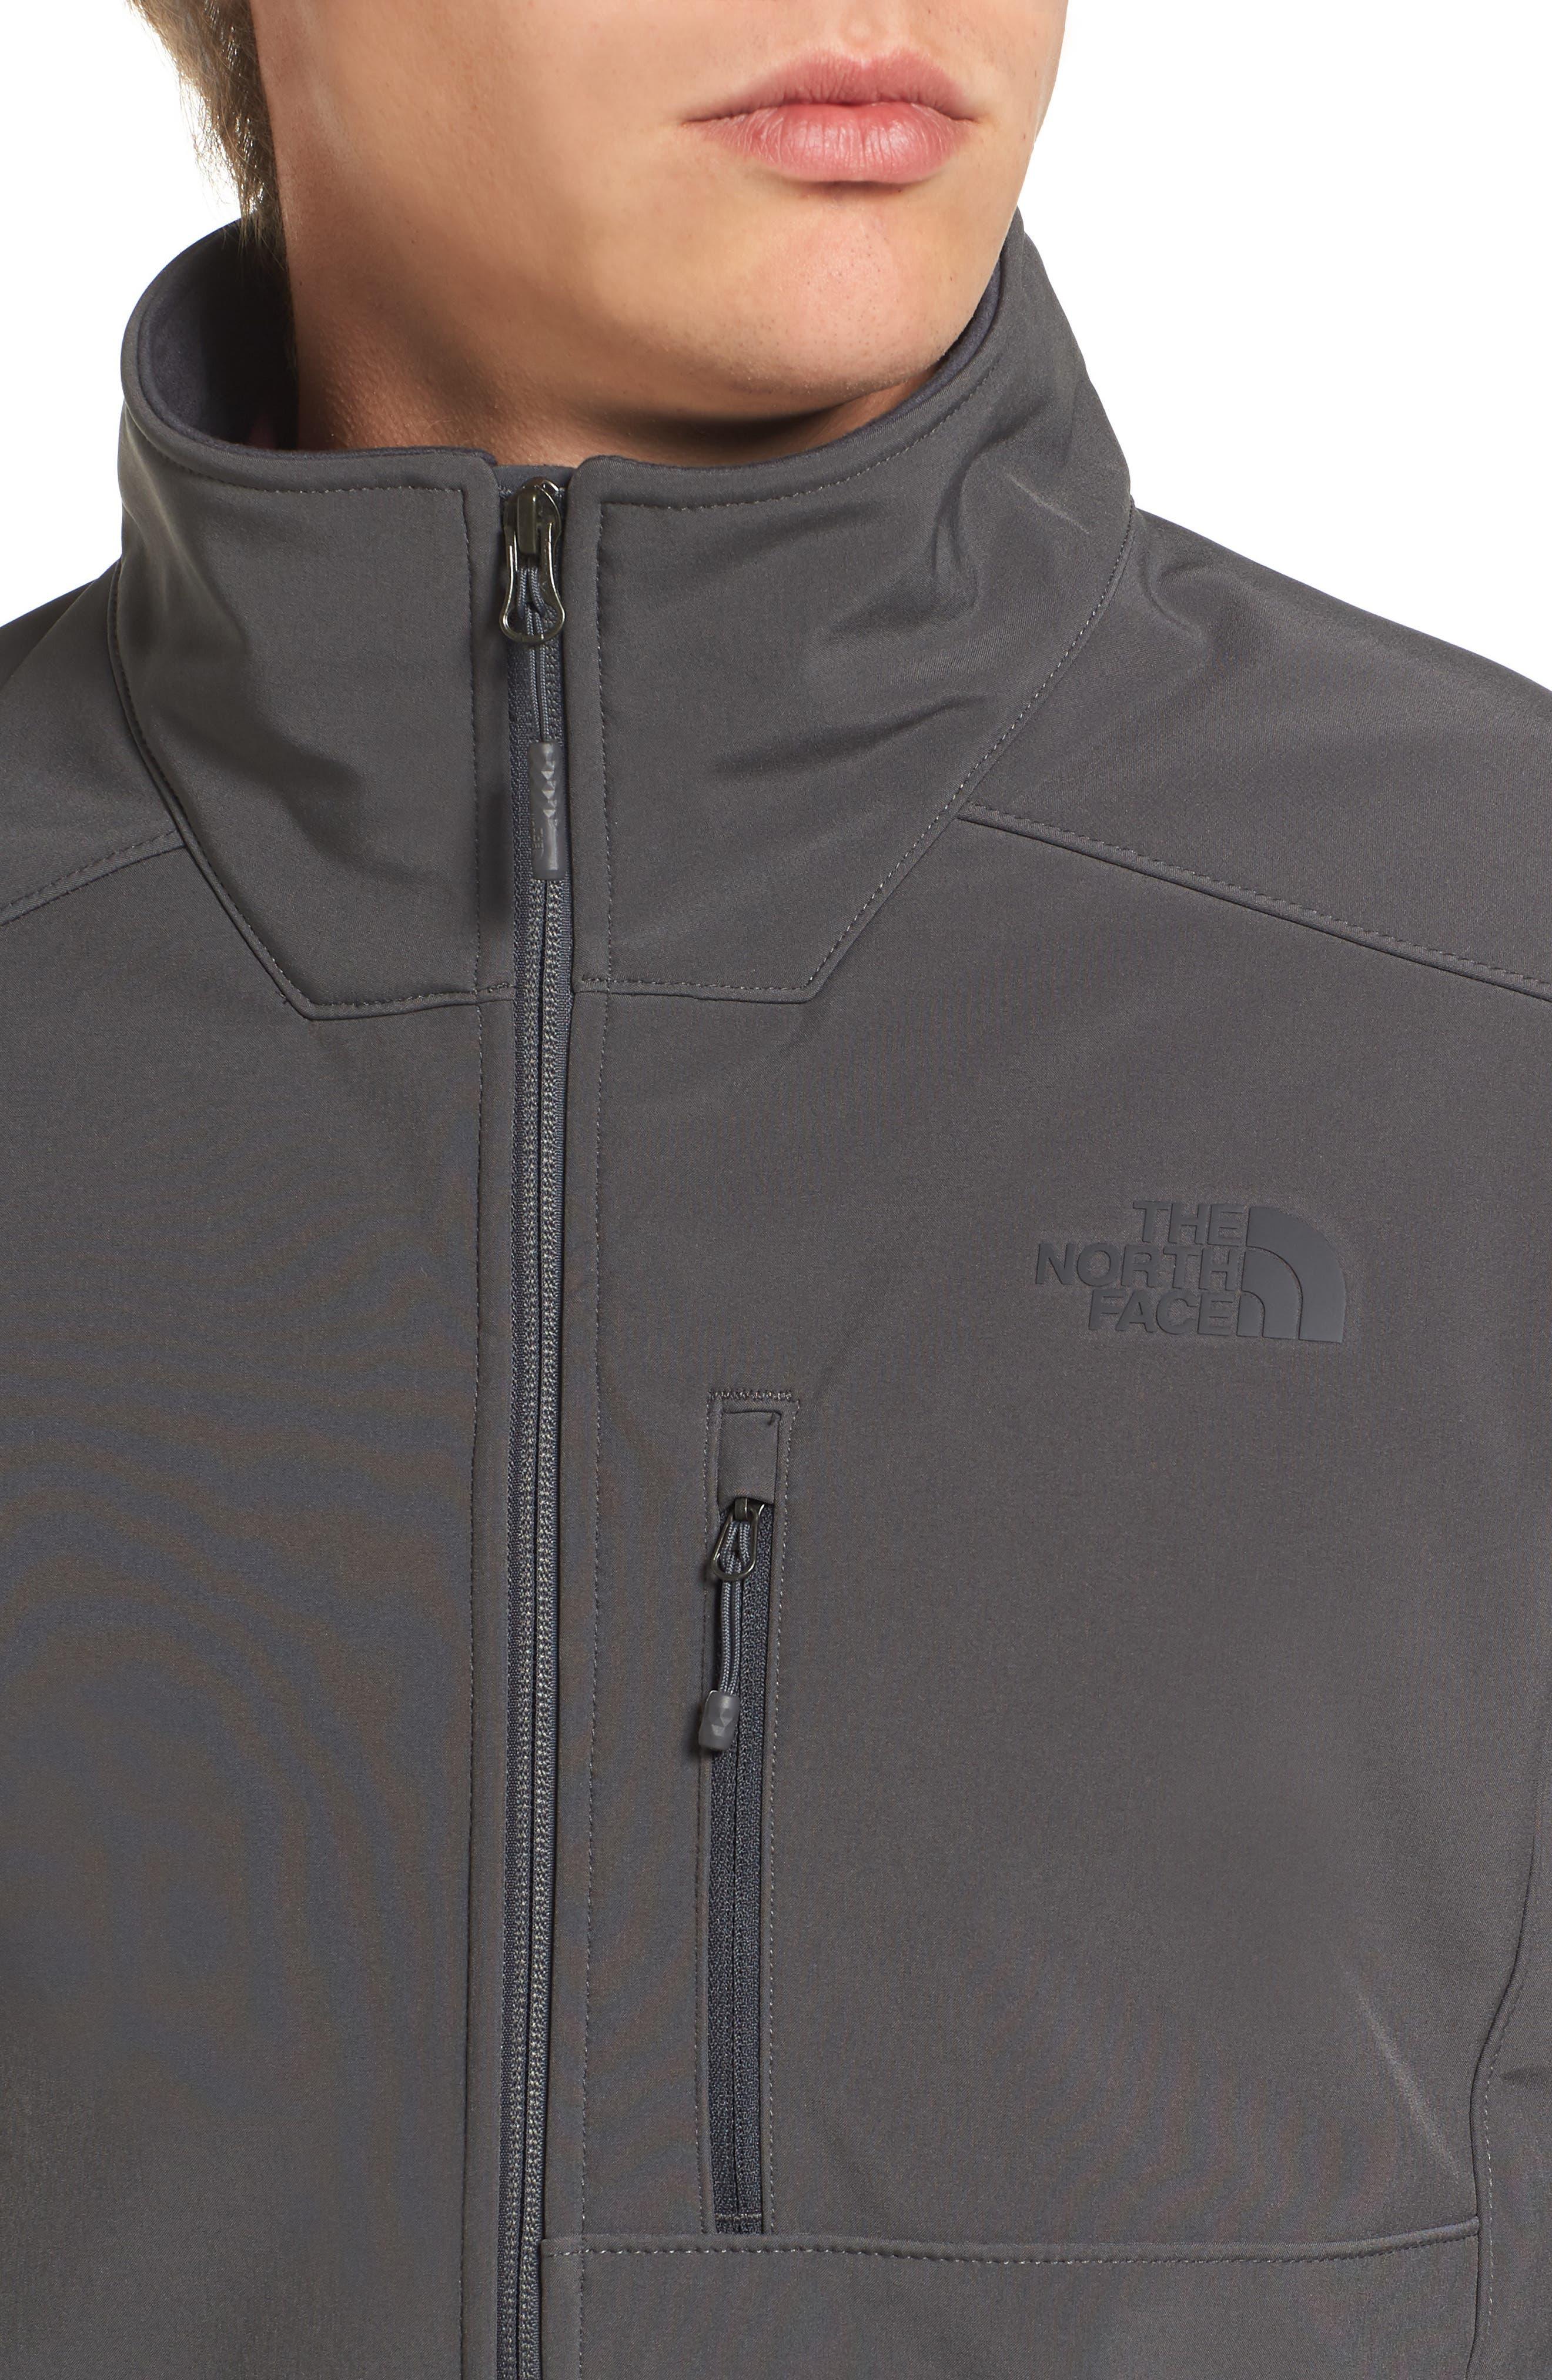 'Apex Bionic 2' Windproof & Water Resistant Soft Shell Jacket,                             Alternate thumbnail 4, color,                             ASPHALT GREY/ASPHALT GREY